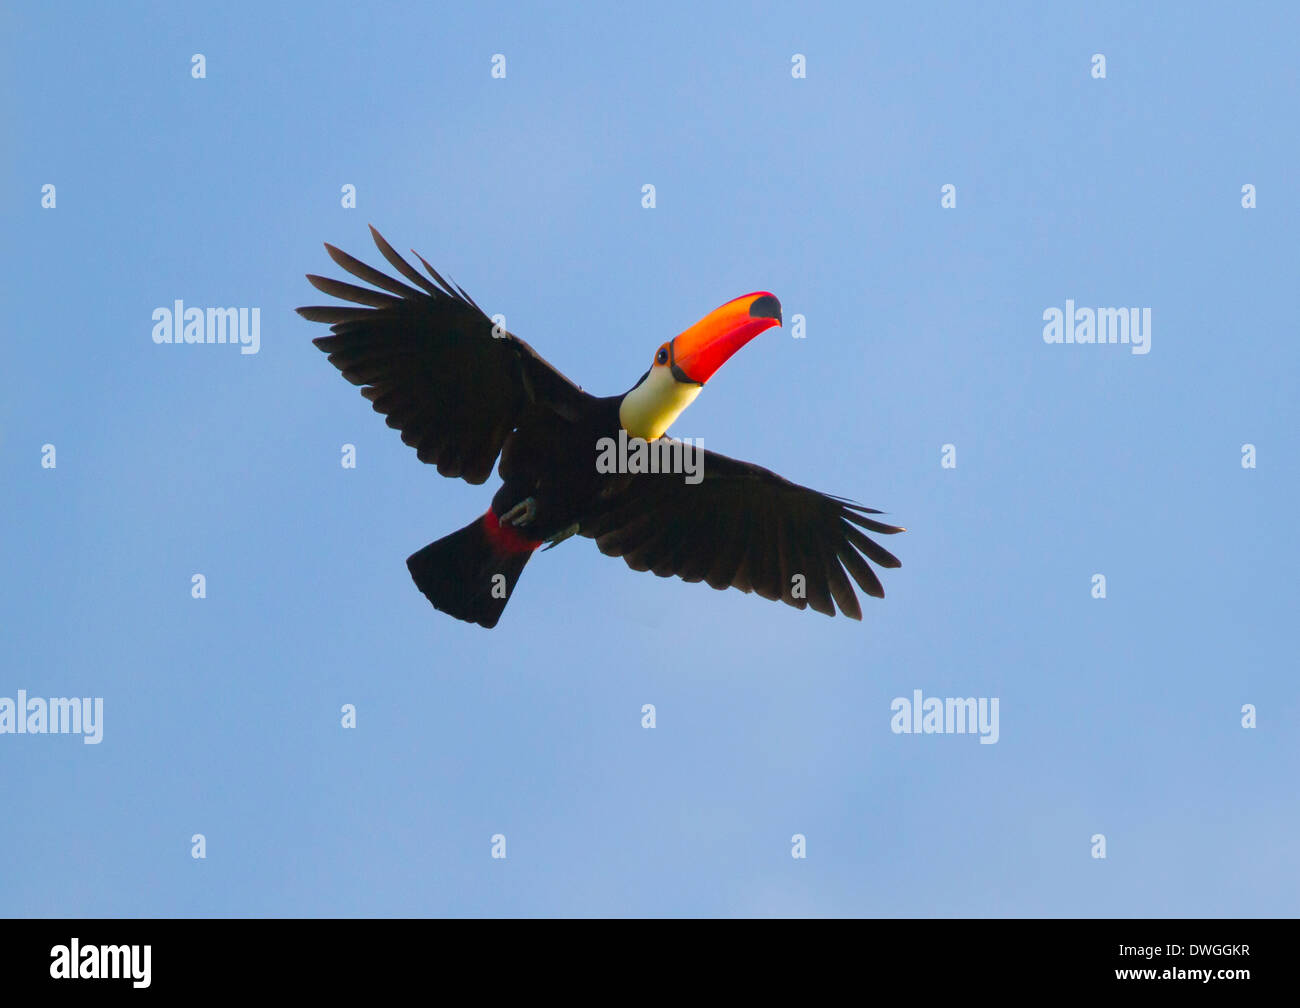 TOCO TOUCAN (Ramphastos toco) in flight, Rupununi river, Guyana, South America. - Stock Image